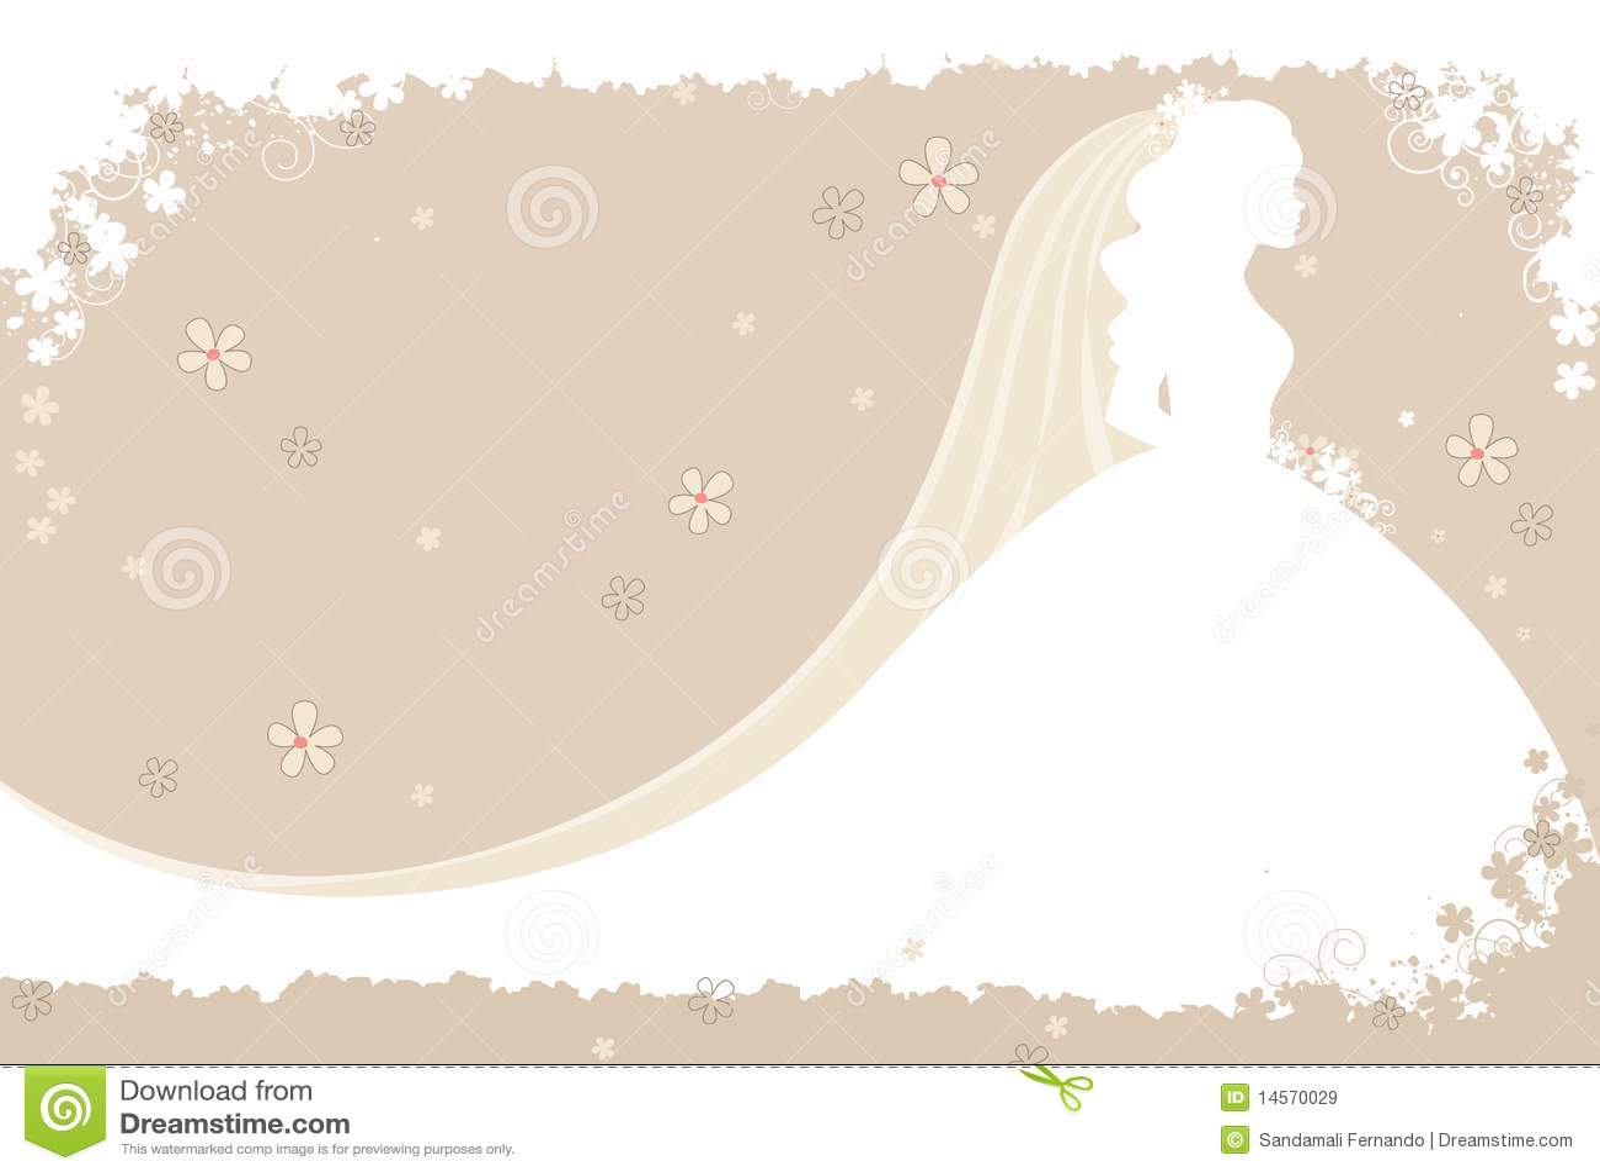 free download wedding invitation card design